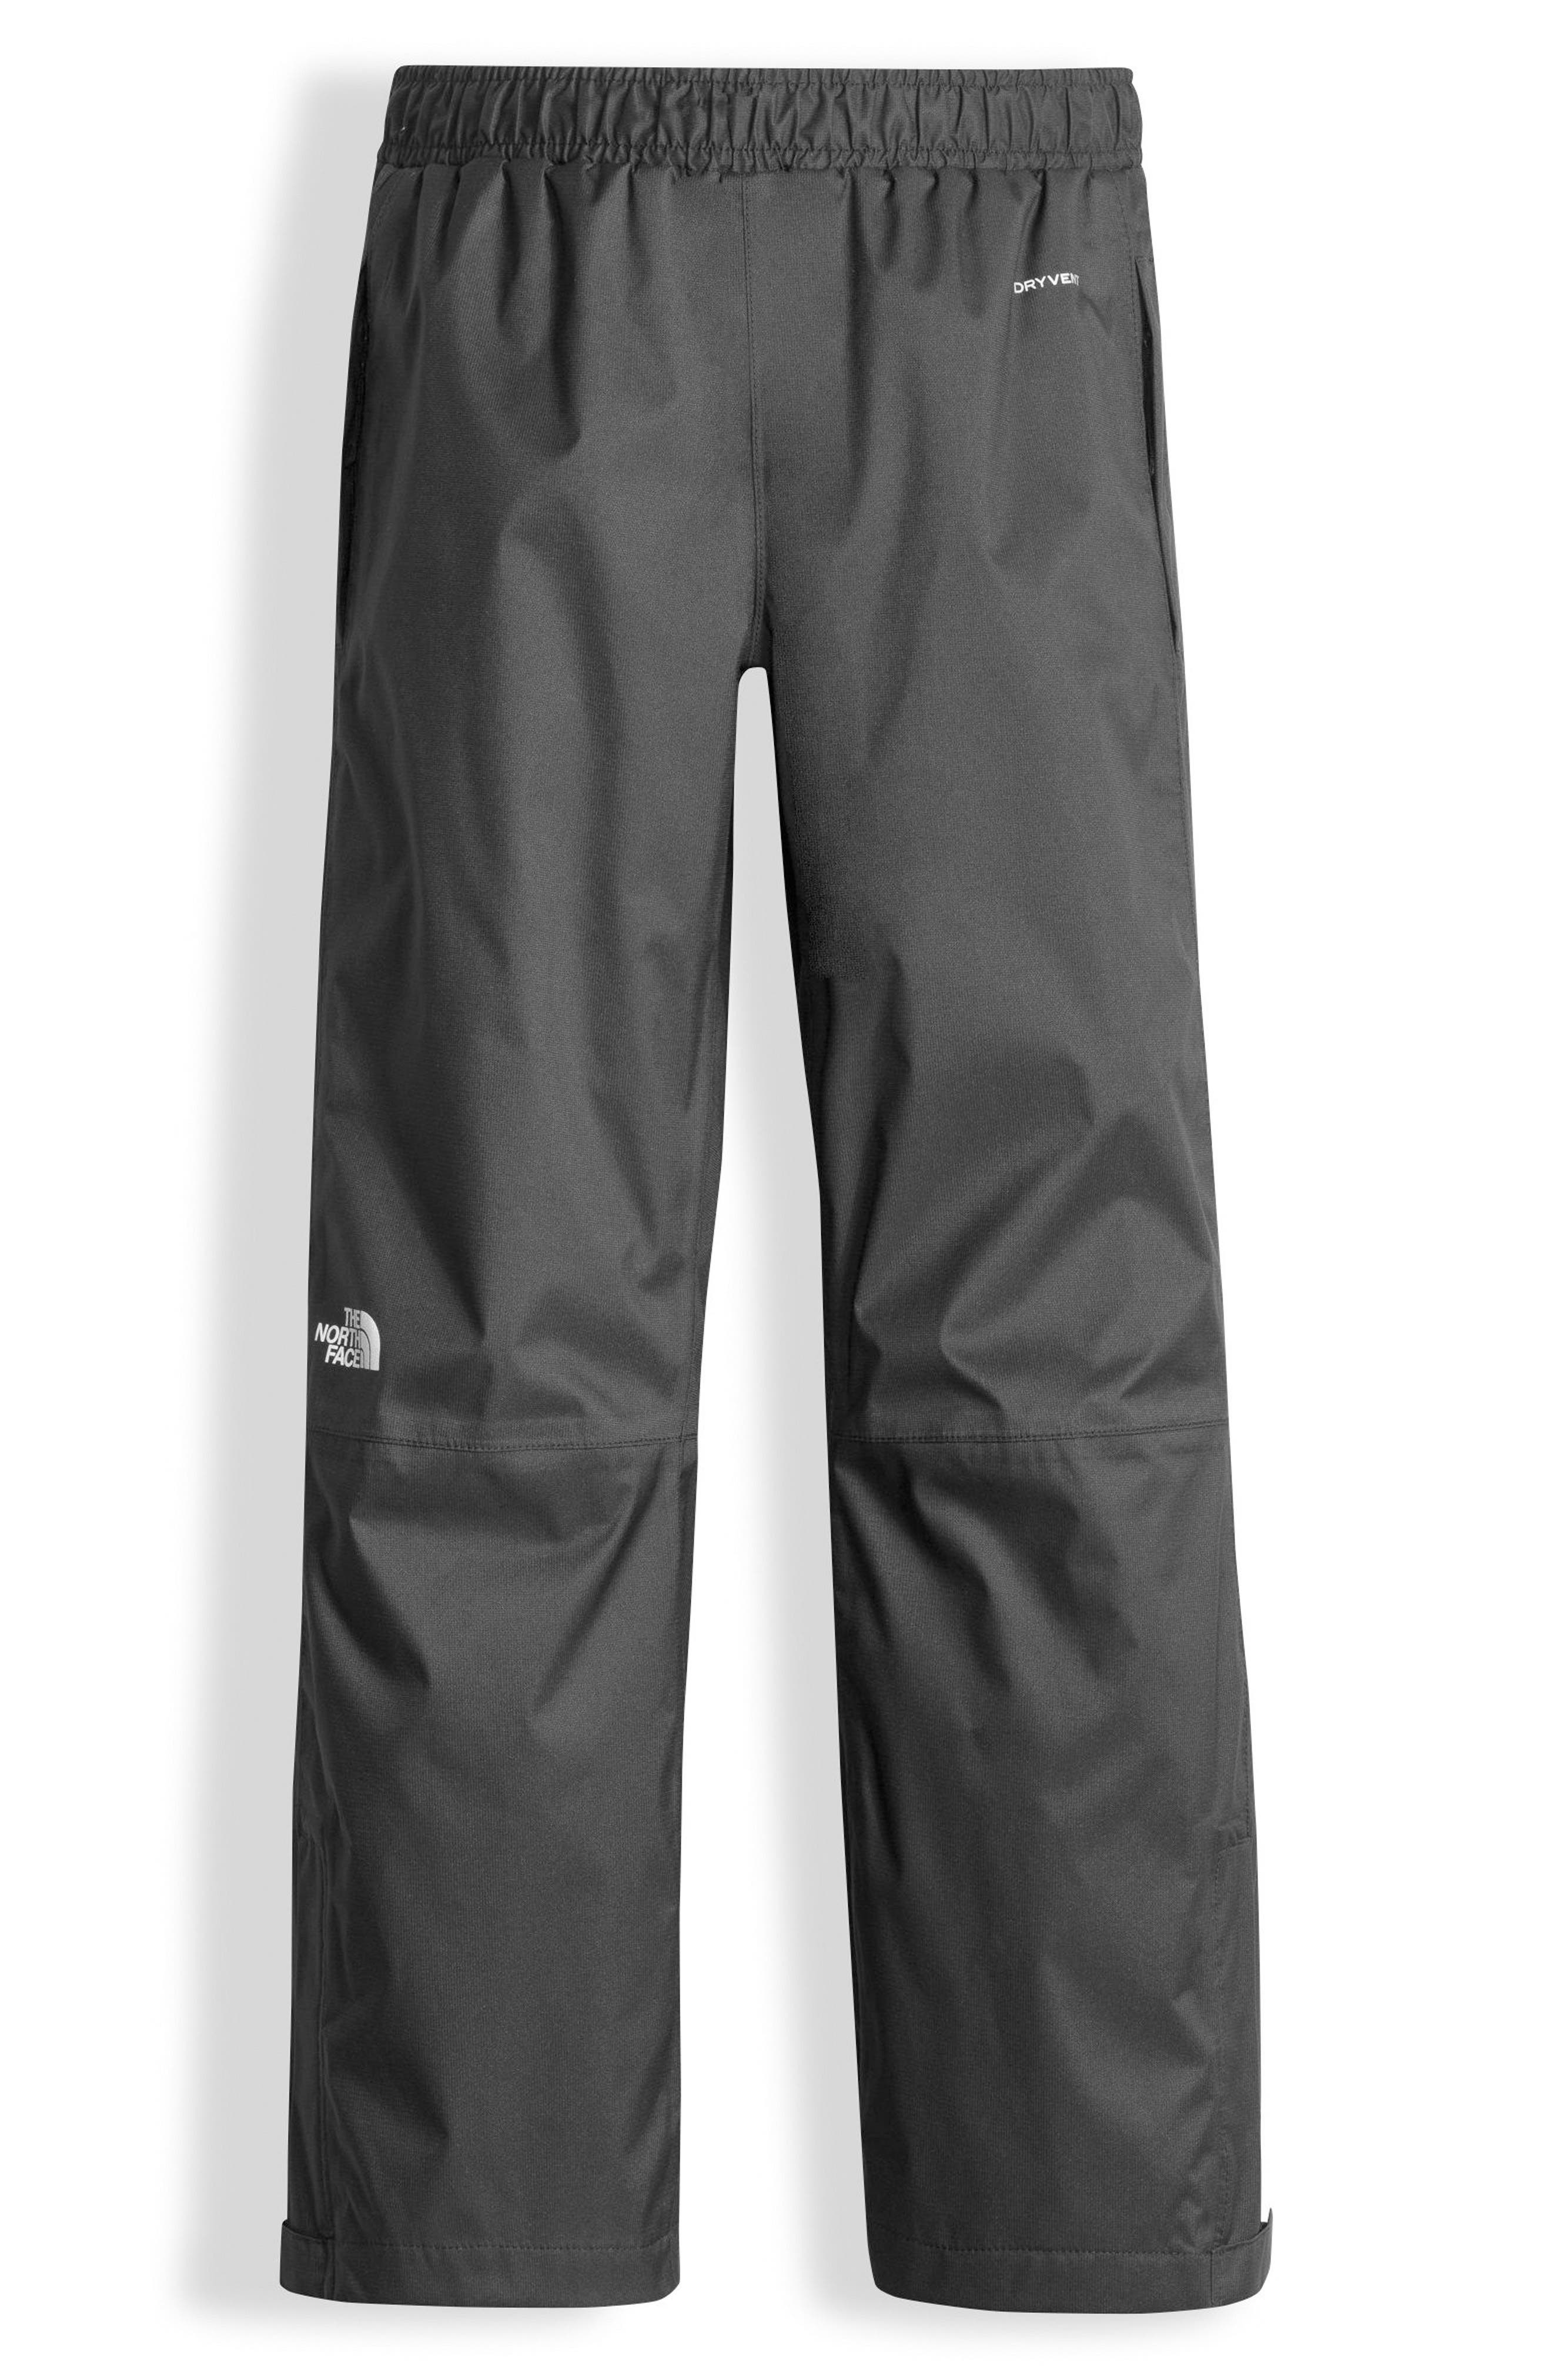 'Resolve' Waterproof Rain Pants,                             Main thumbnail 1, color,                             Graphite Grey